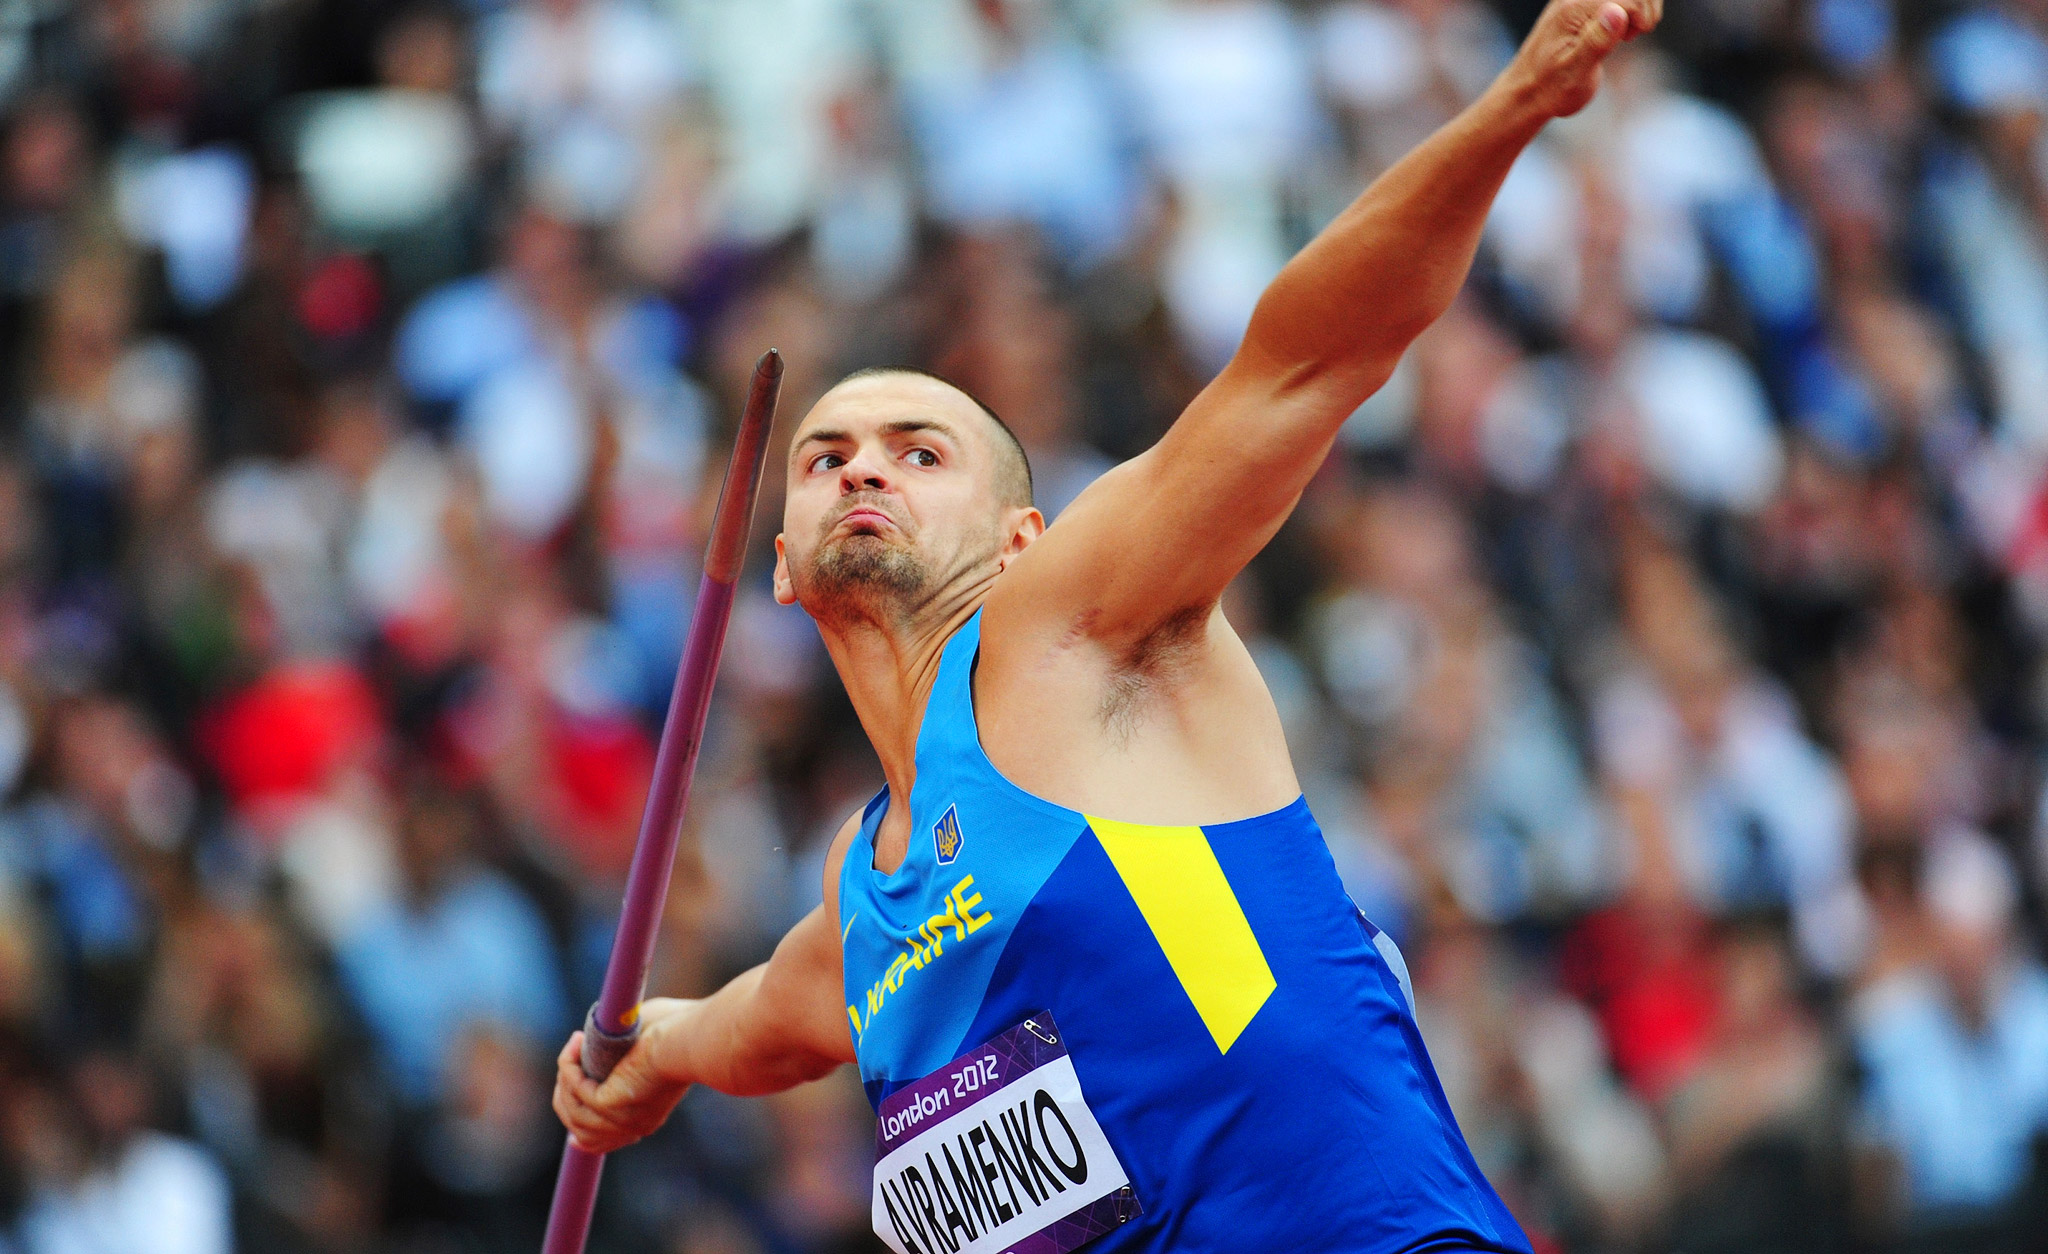 Roman Avramenko